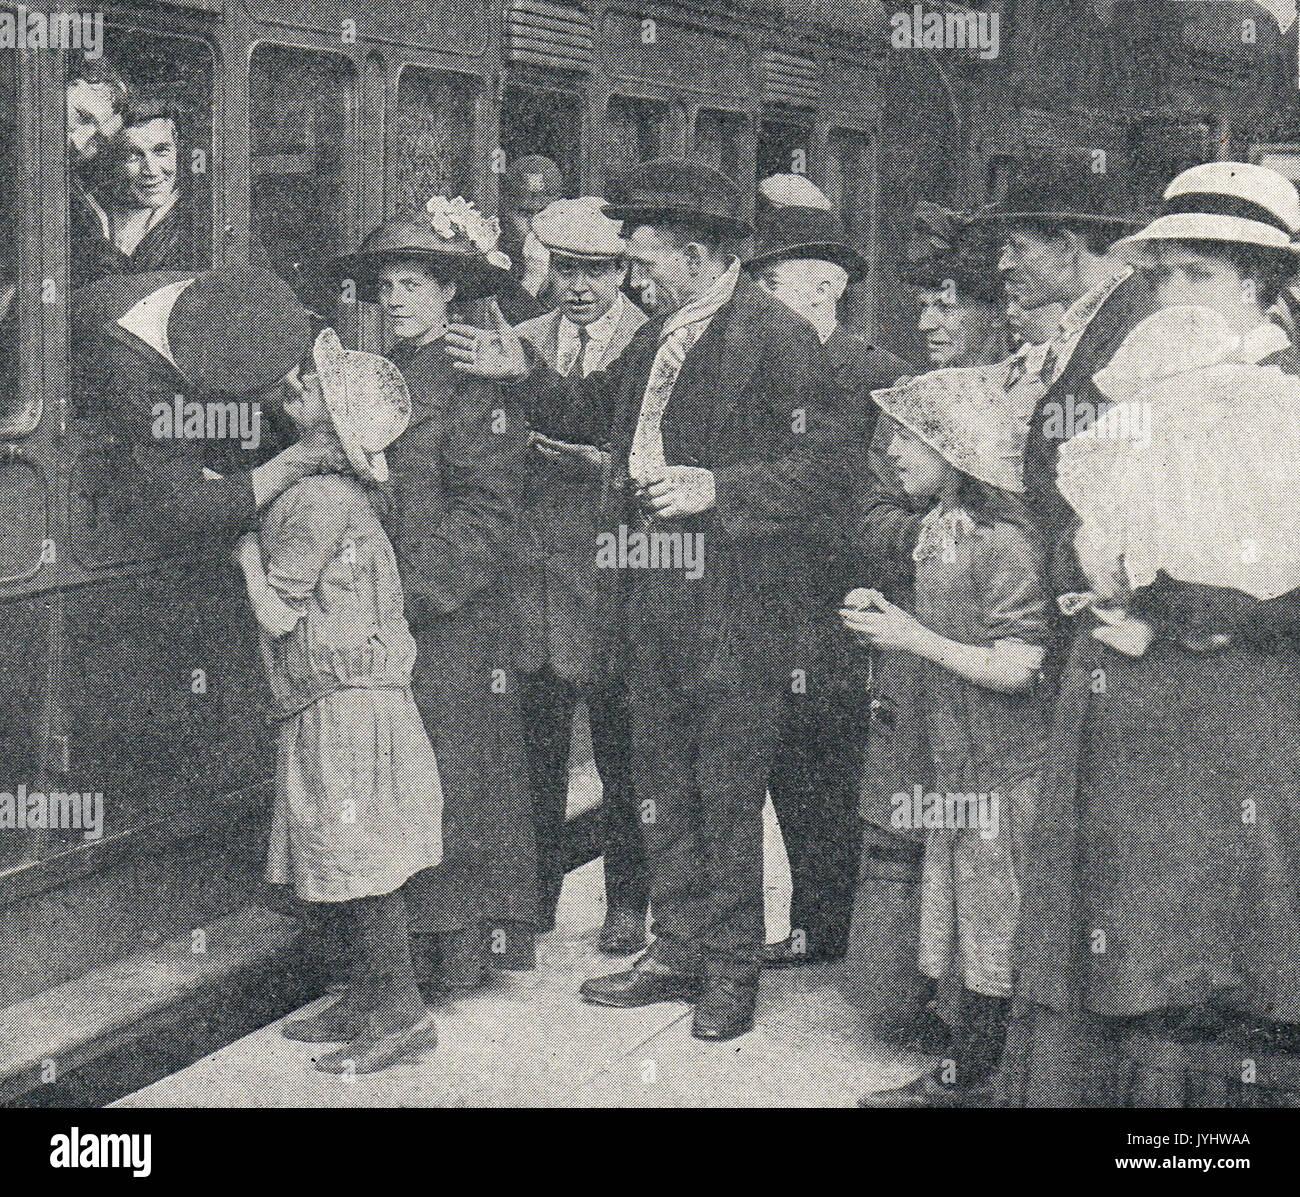 Sailors saying farewell, departing for war, WW1 - Stock Image